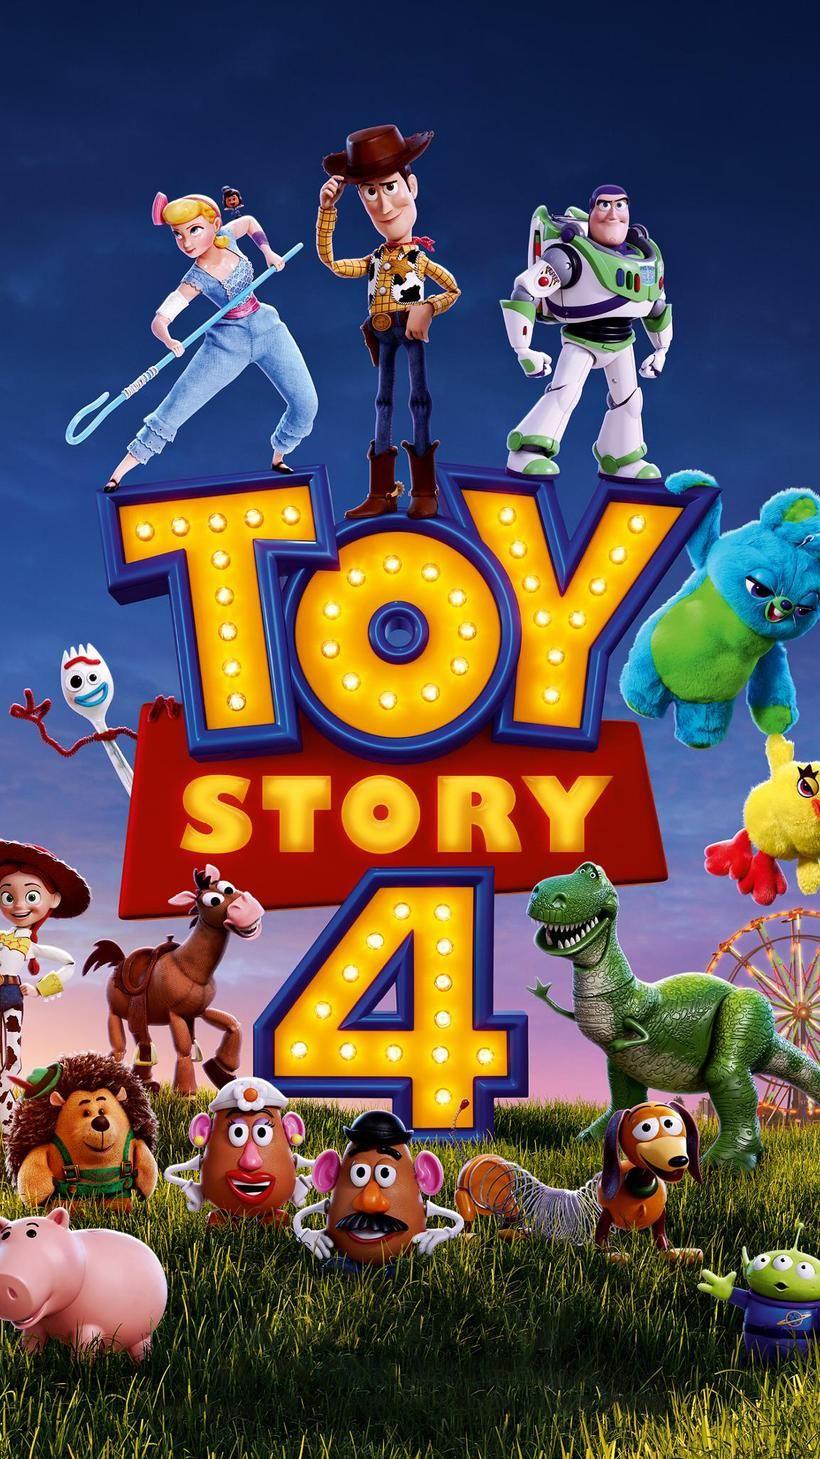 26 Pixar S Toy Story 4 Wallpapers On Wallpapersafari